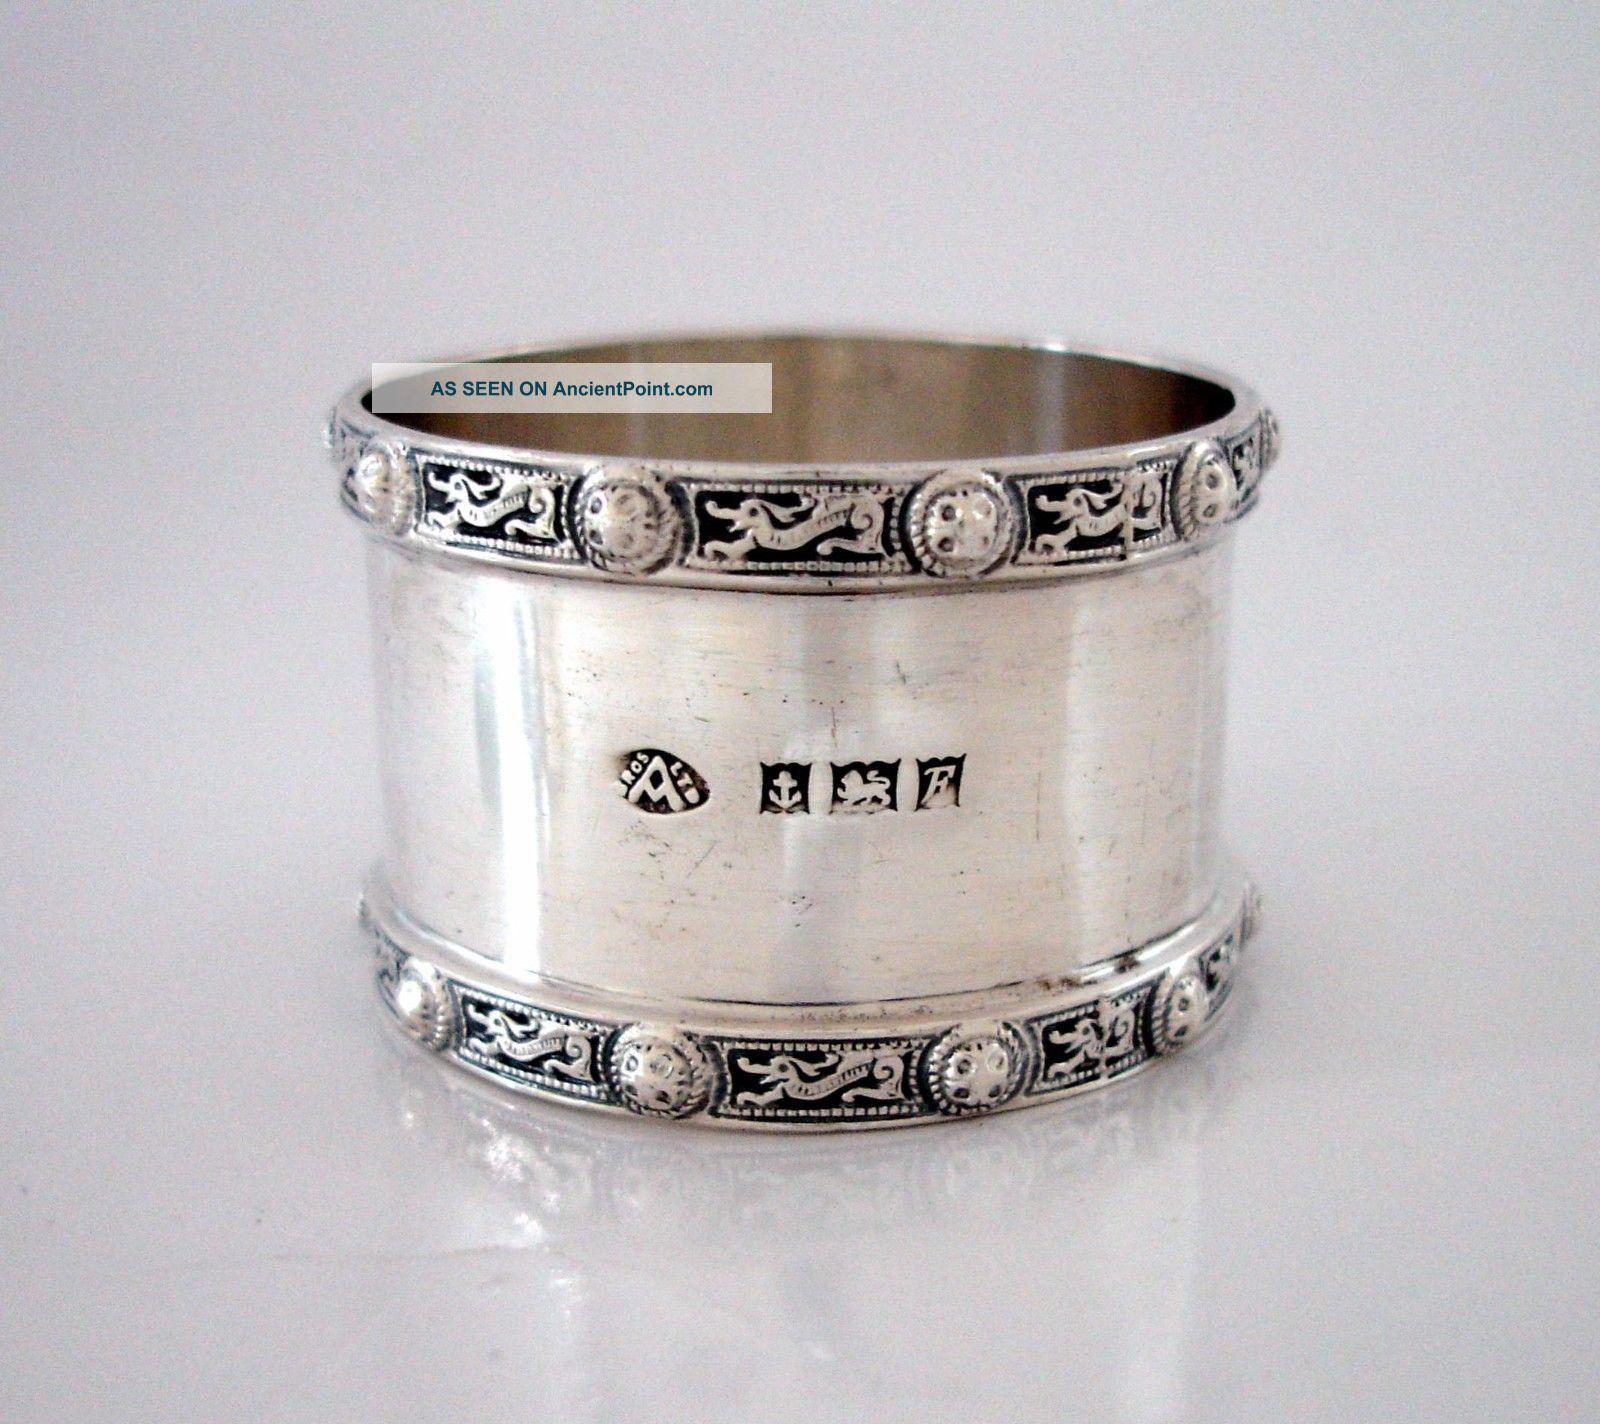 Ramsden Style Keltic Dragon Rims English Sterling Silver Napkin Ring Adie Bros Napkin Rings & Clips photo